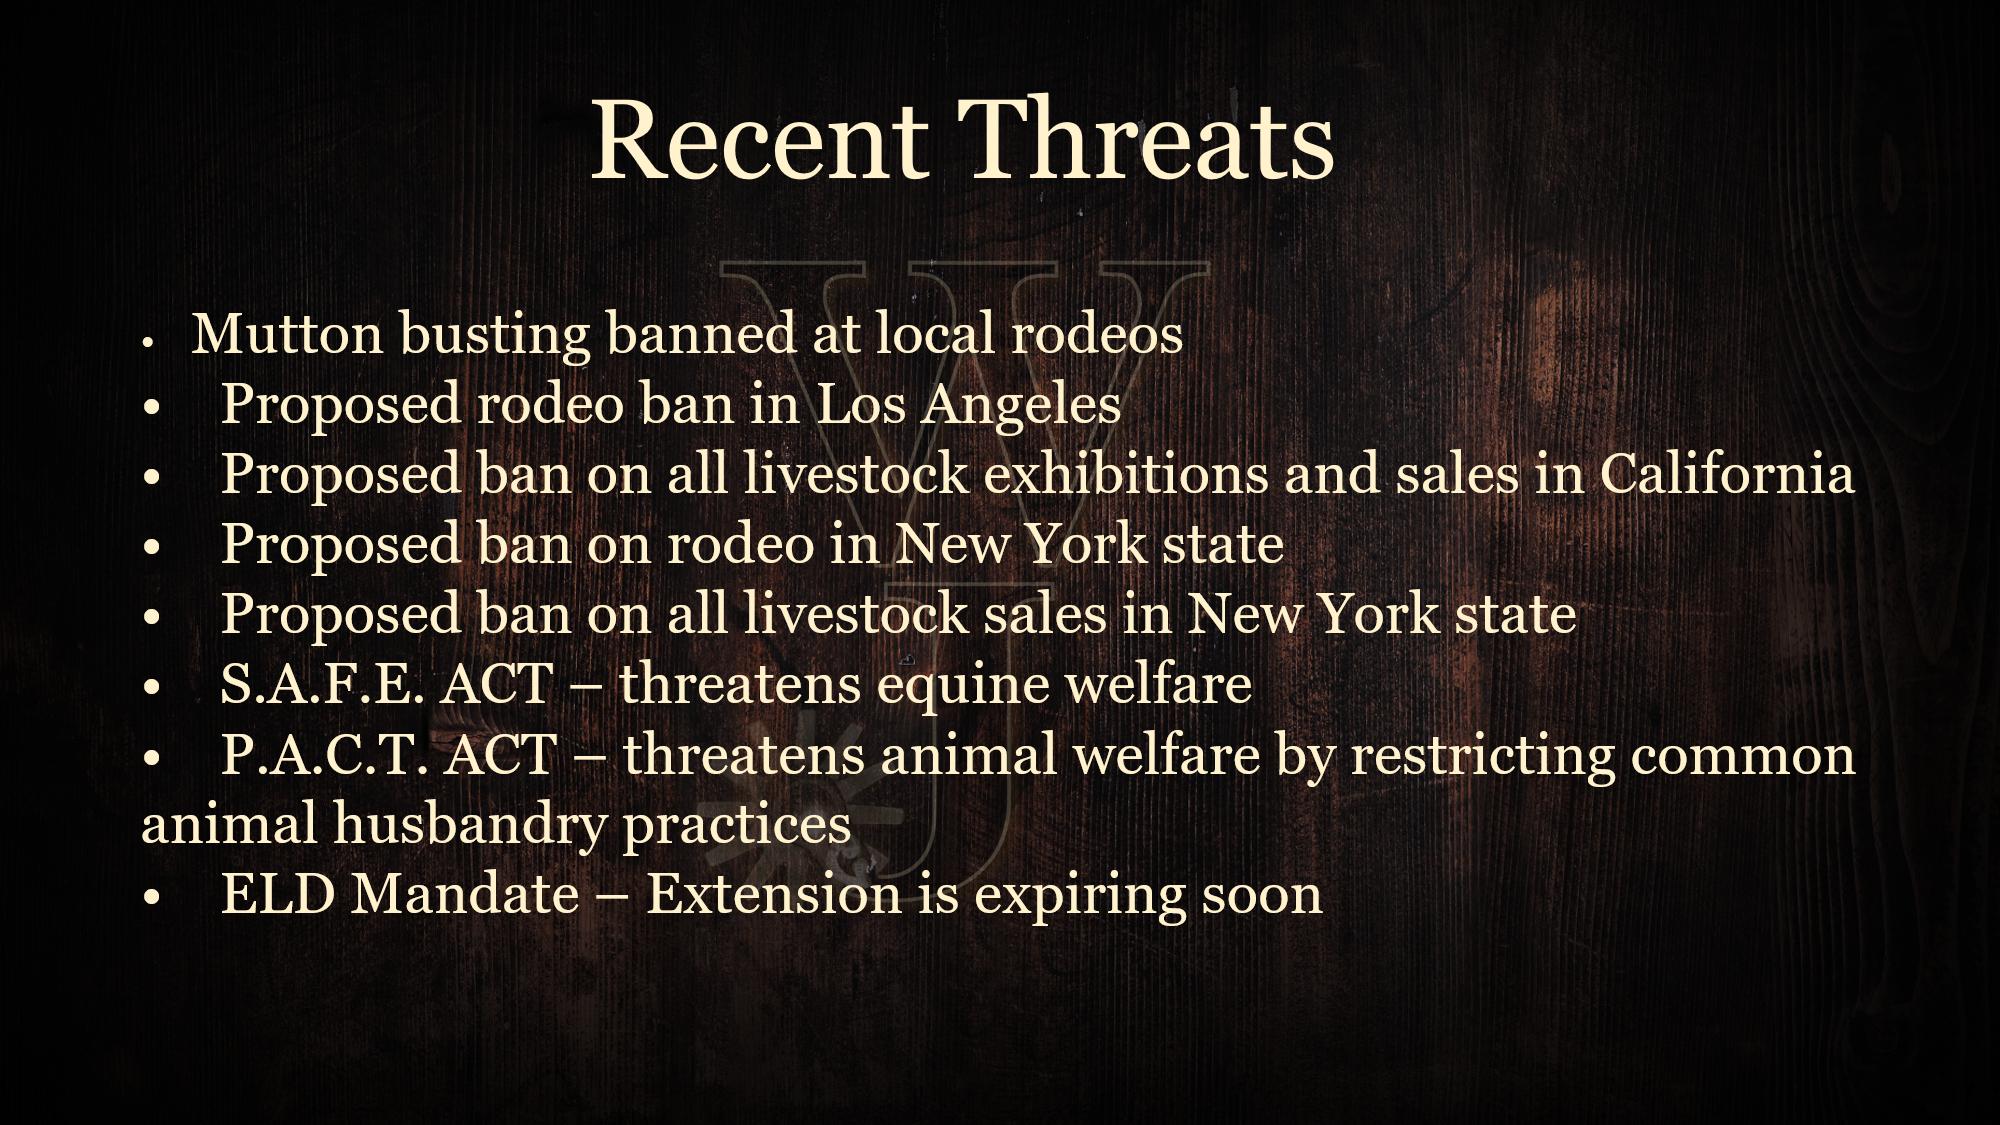 Recent Threats Graphic